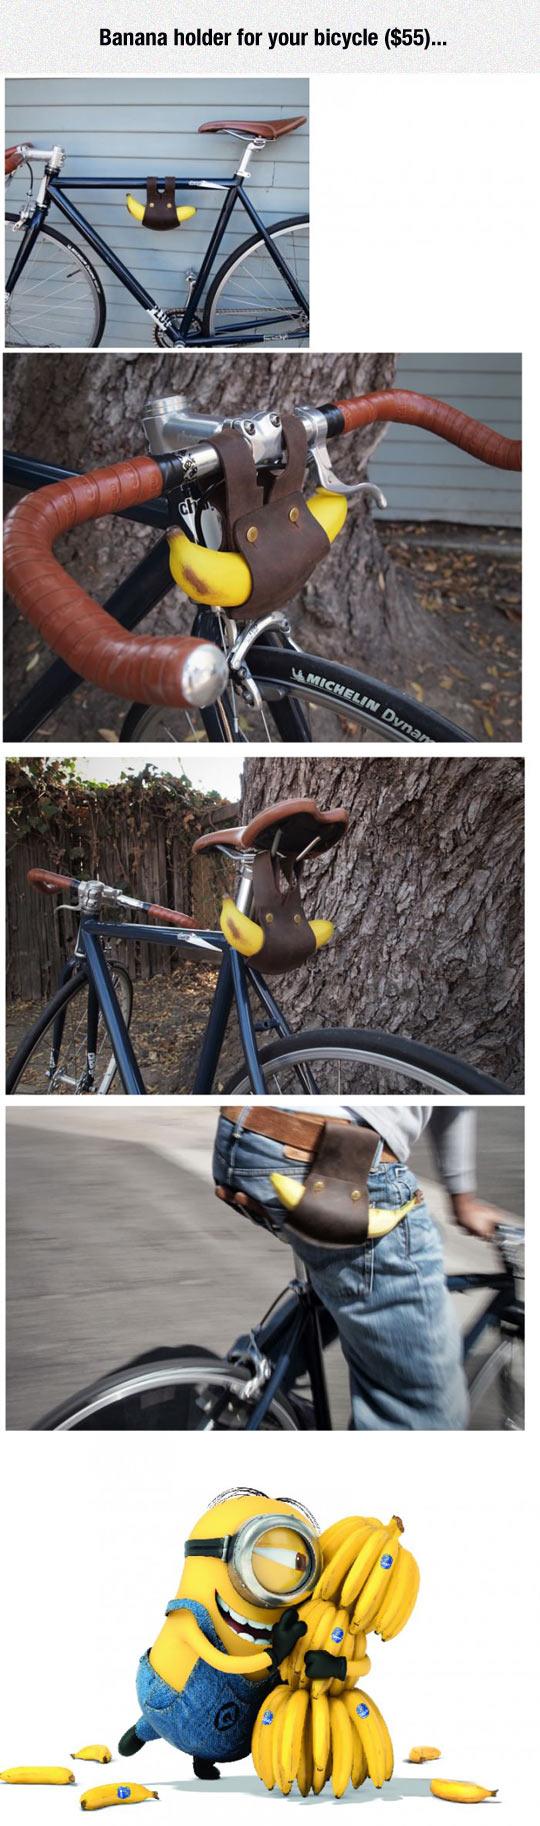 cool-banana-holder-bicycle-price